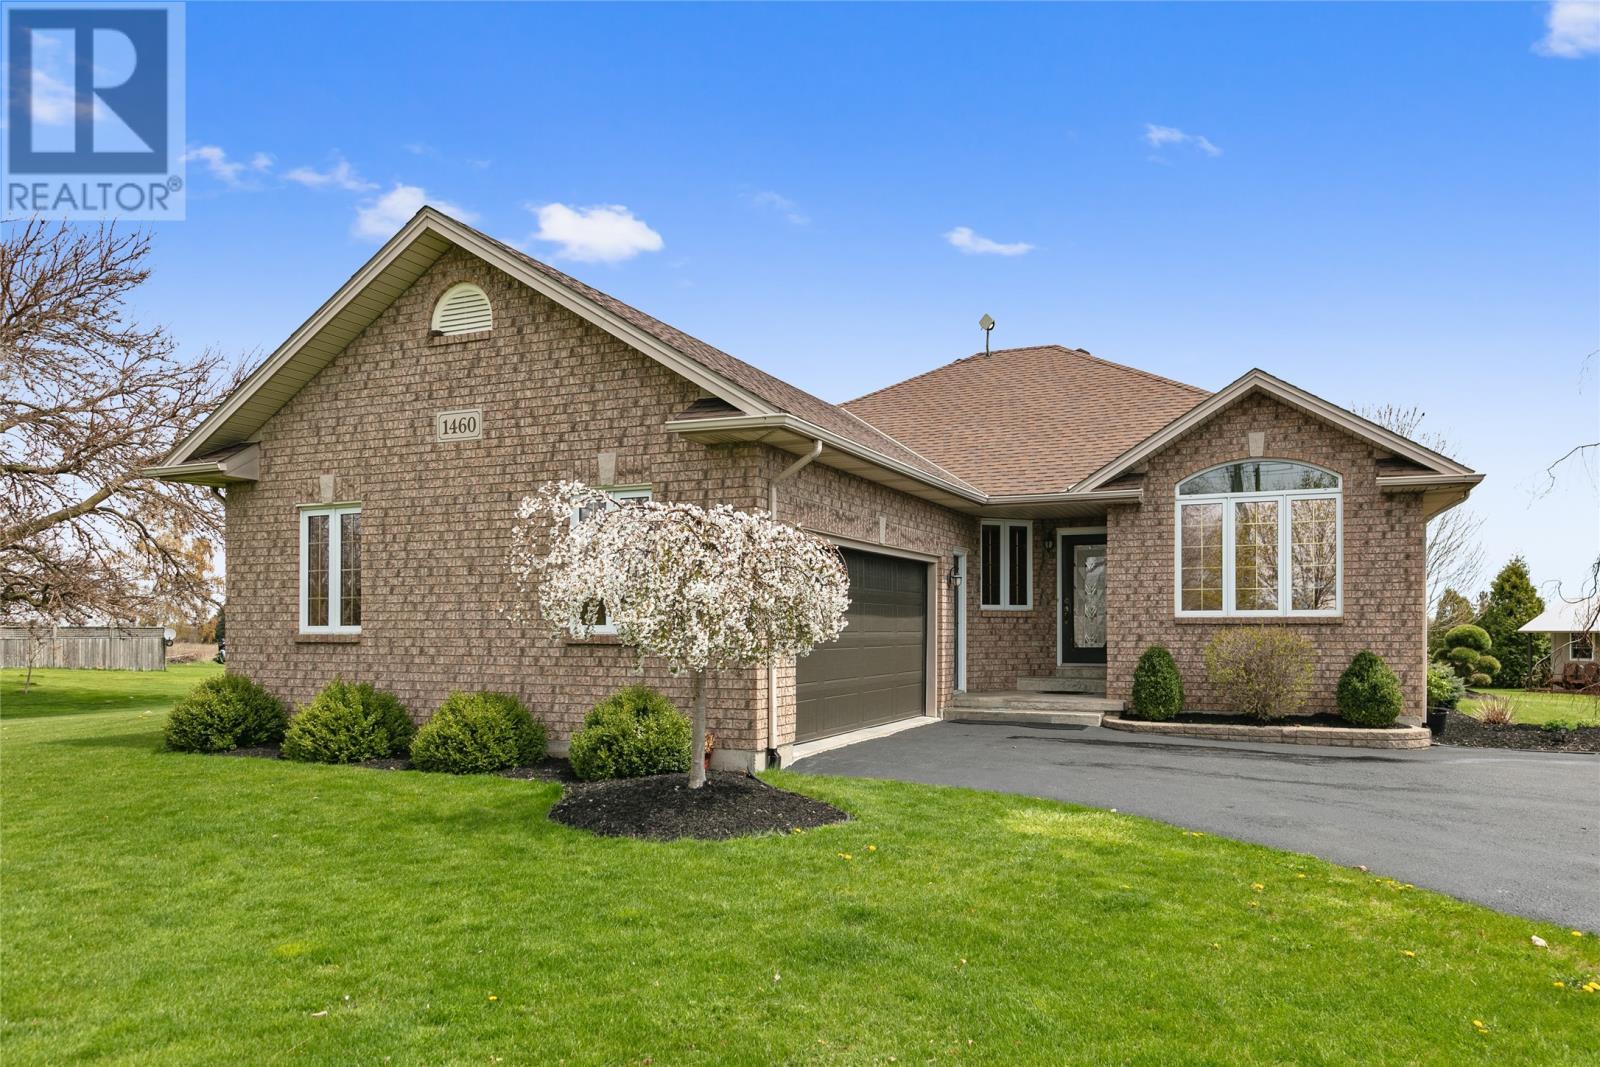 1460 Ridge Rd, Harrow Home For Sale!